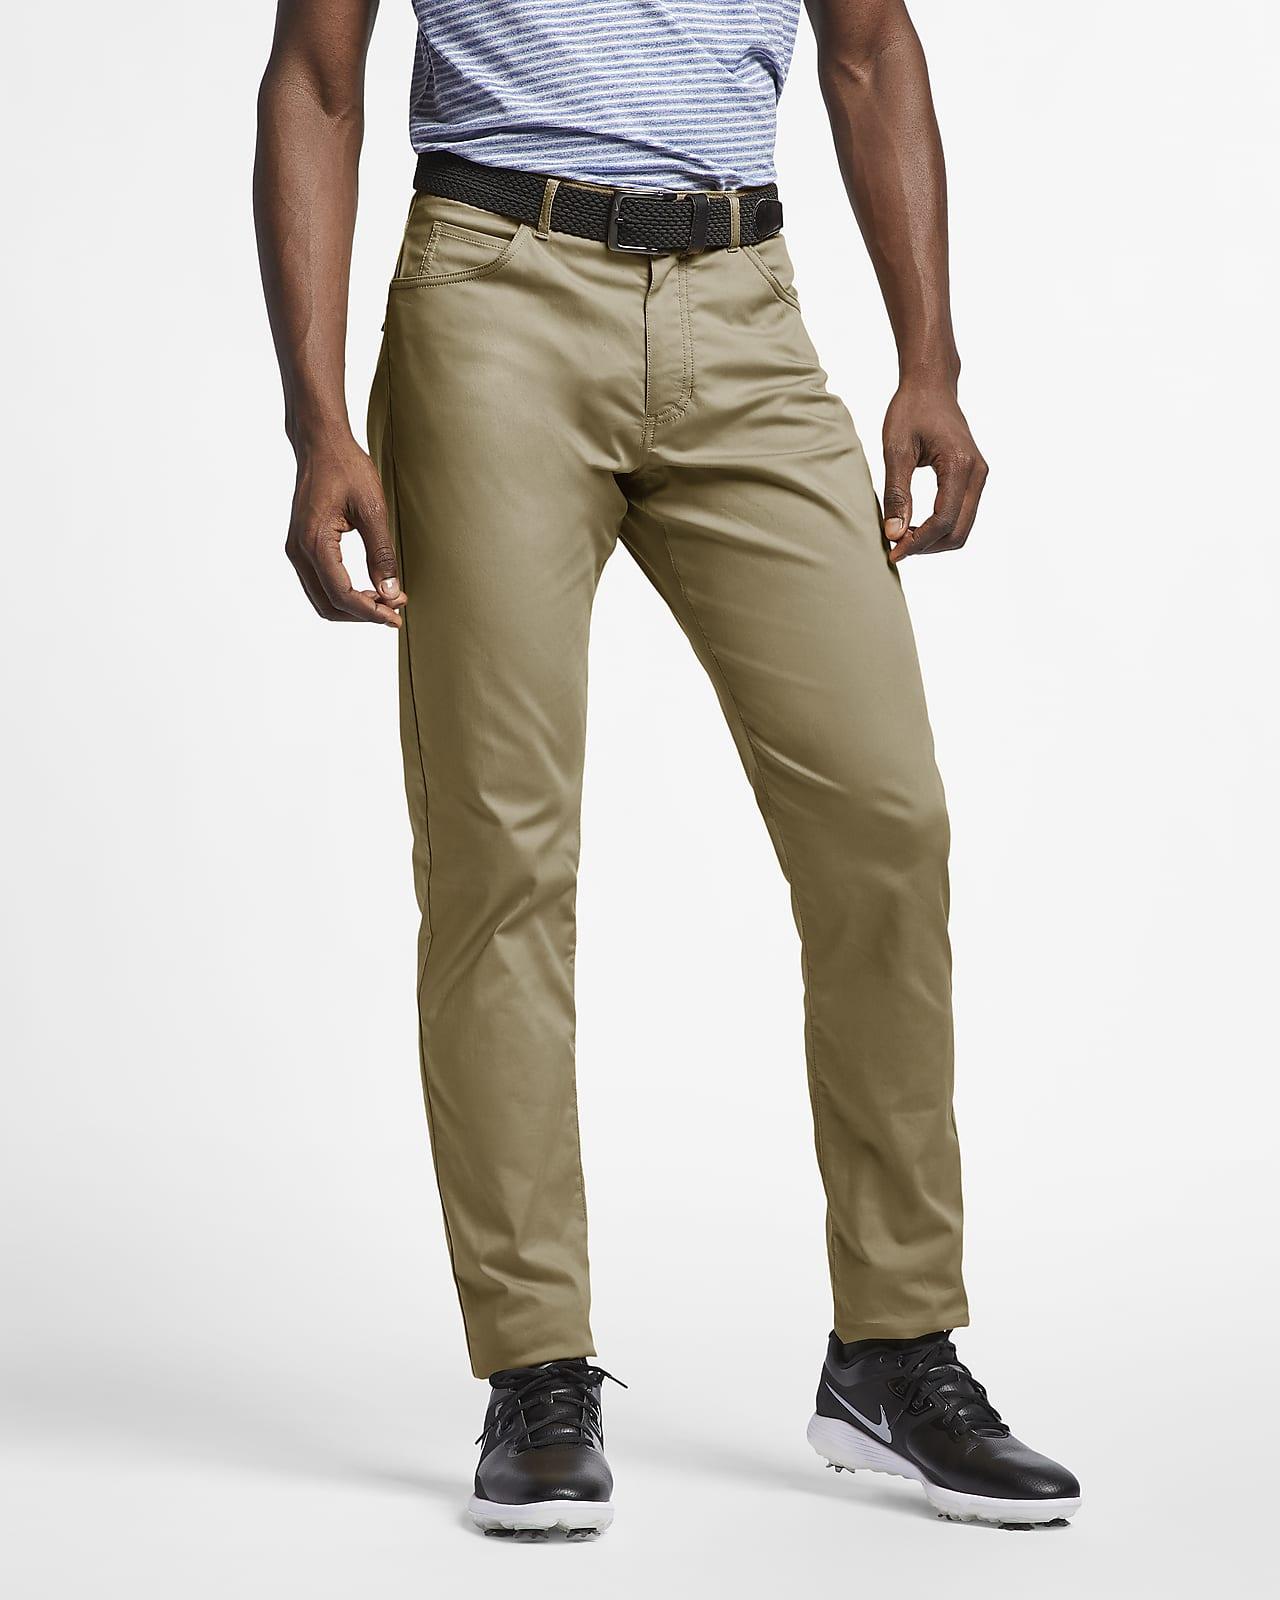 Slim Fit 5-Pocket Golf Pants. Nike